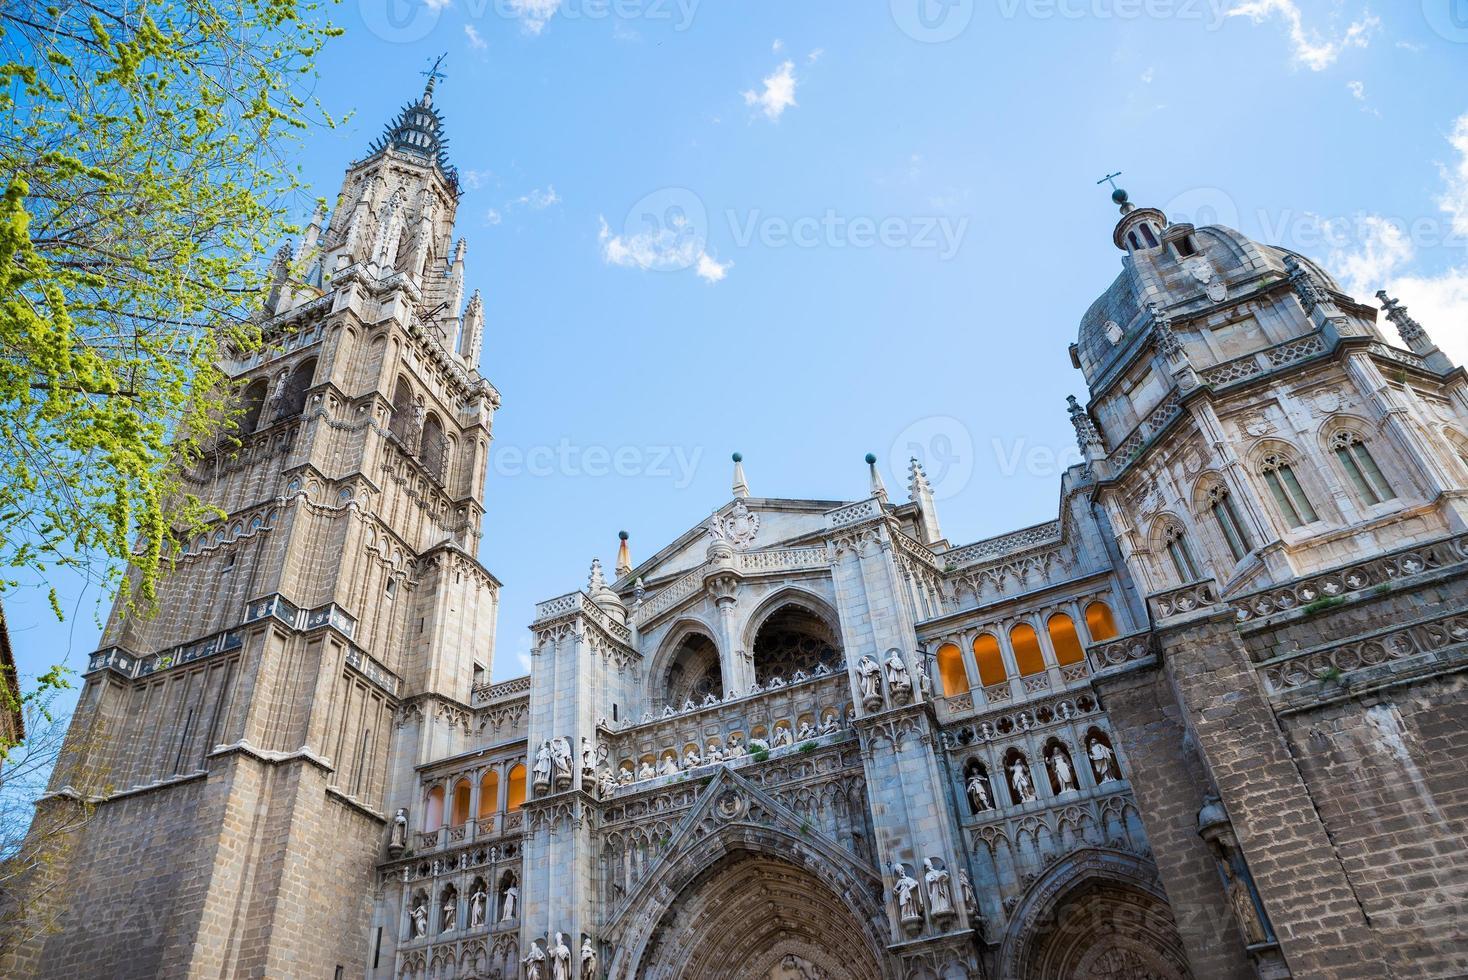 Toledo katedral fasad, spanska kyrkan foto